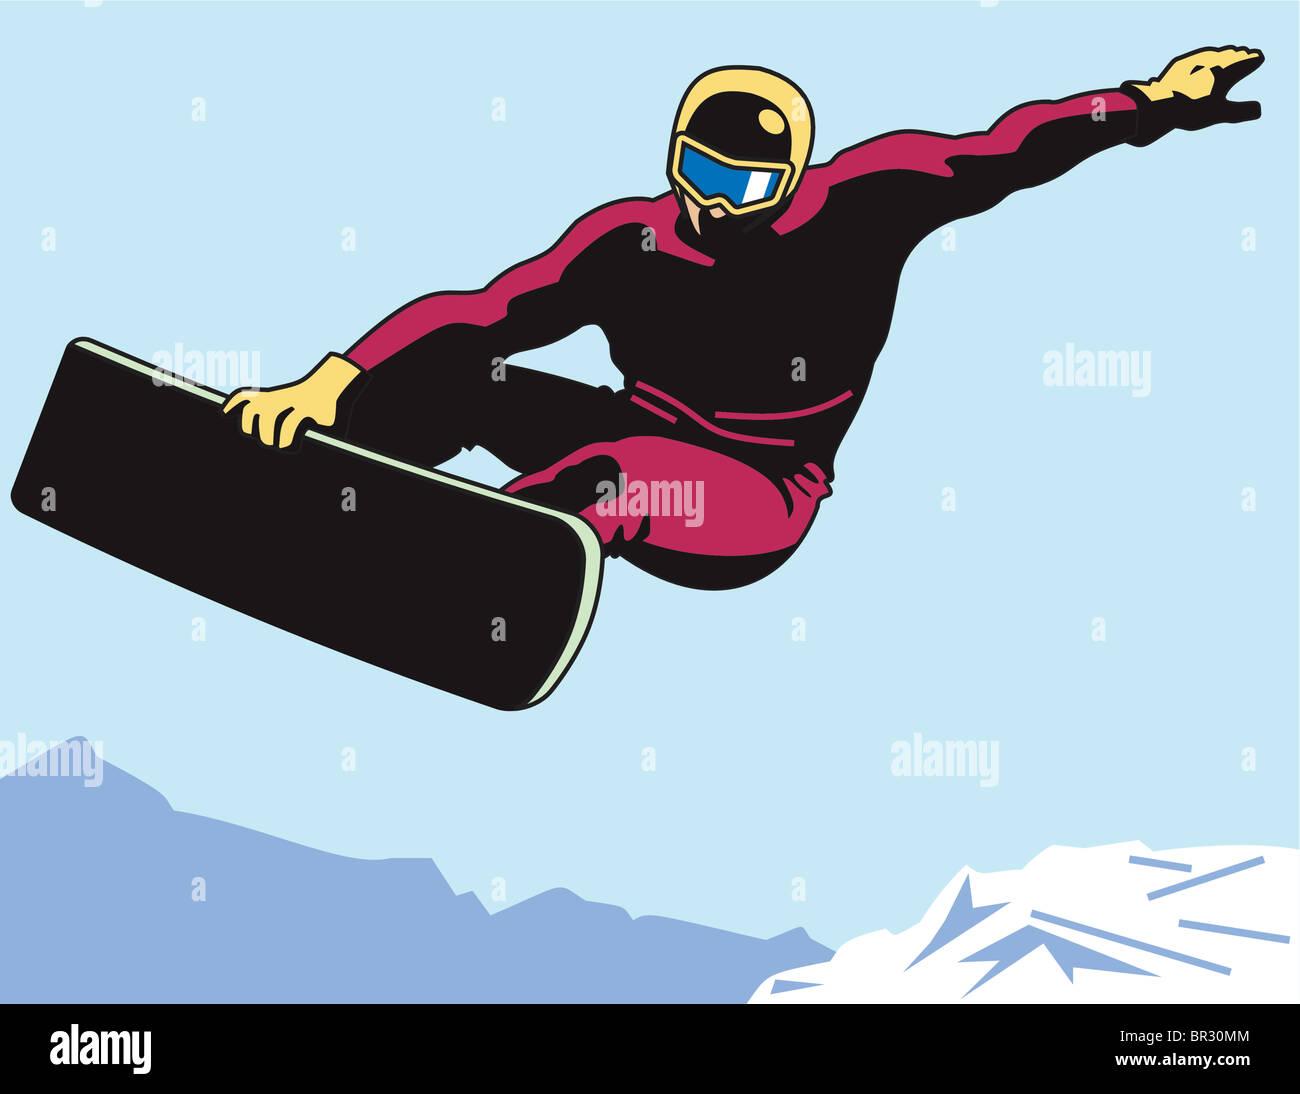 Un hombre snowboard Imagen De Stock